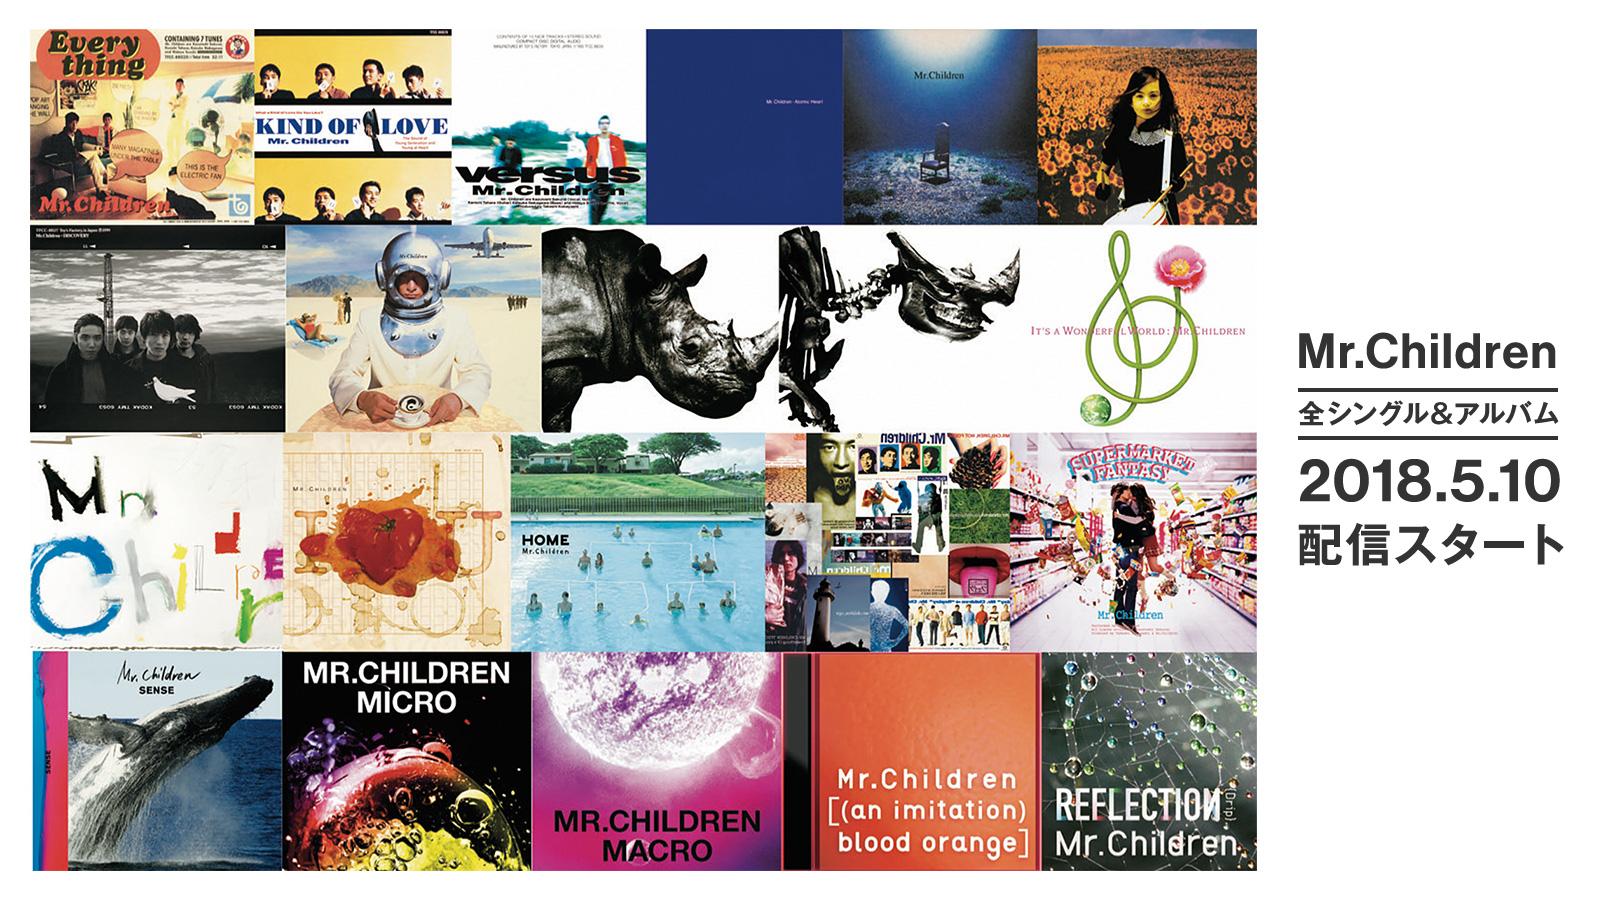 Mr.Childrenが聴き放題に「Apple Music」などで全シングル&アルバム配信スタート